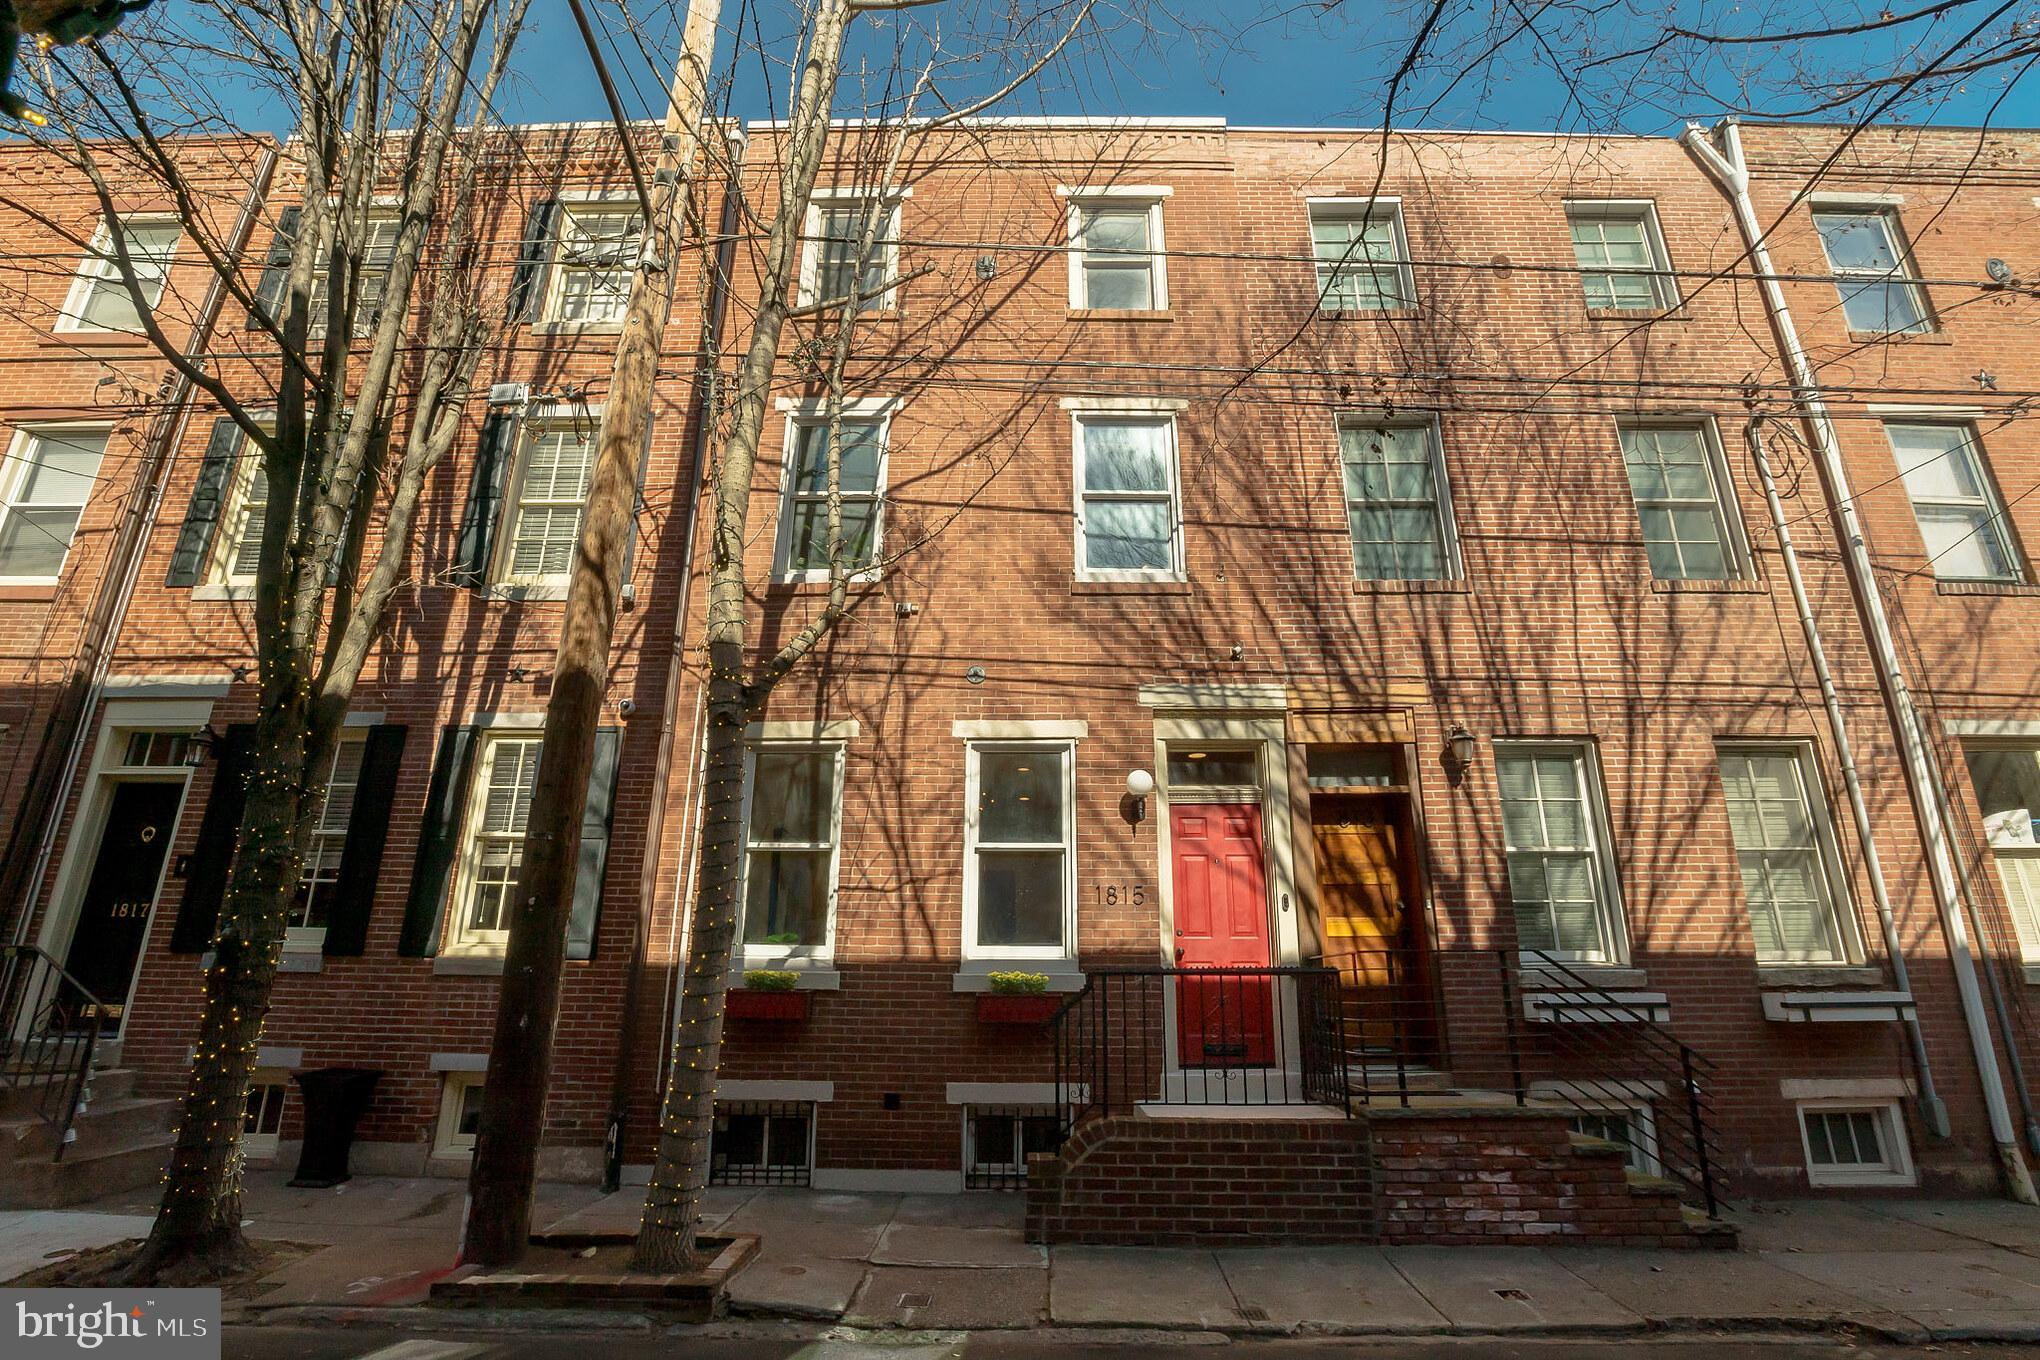 1815 Addison St, Philadelphia, PA, 19146